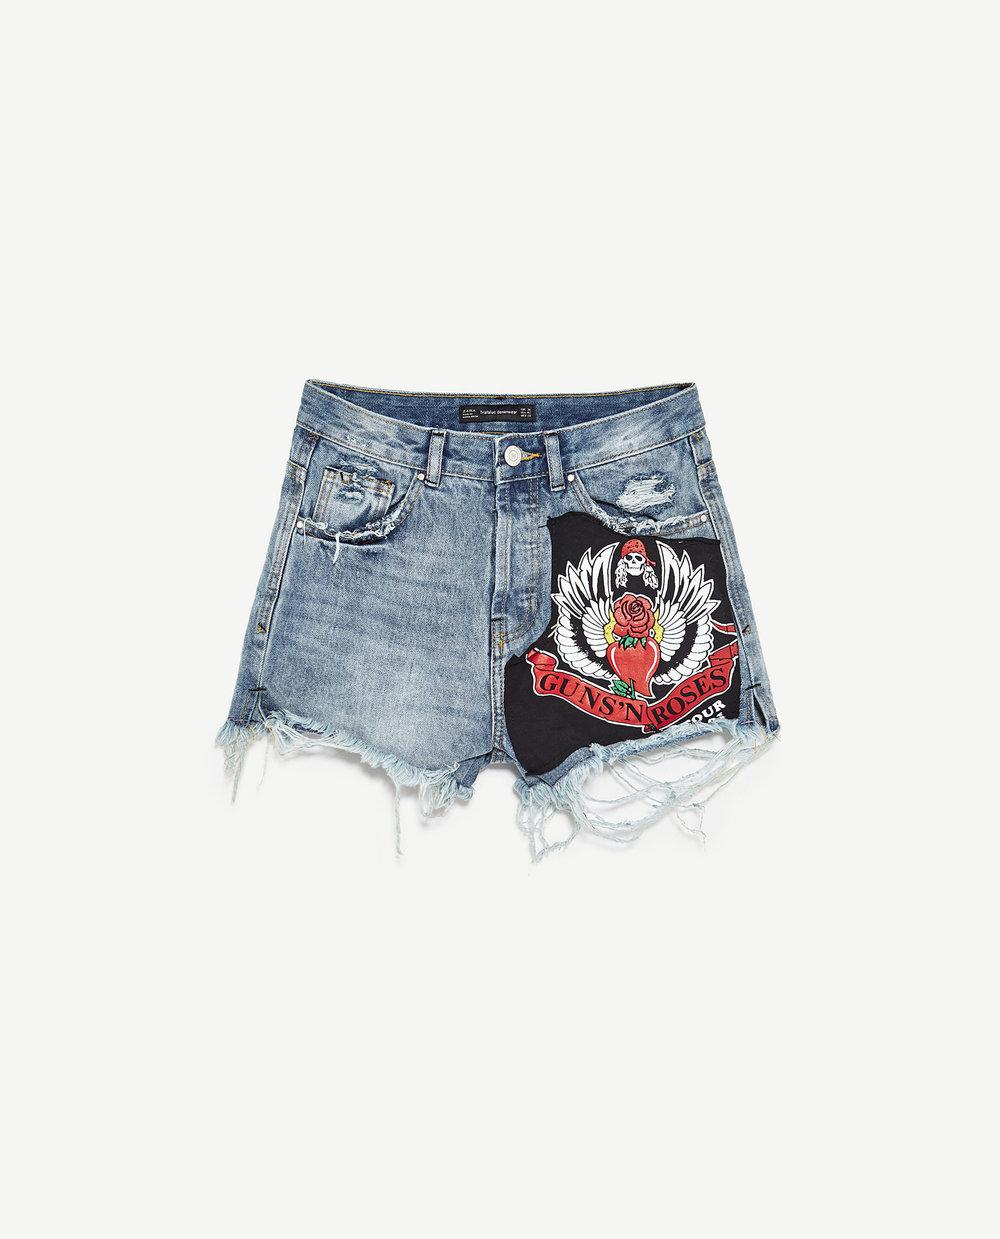 Rocker Bermuda Shorts £25.99 by TRF at Zara